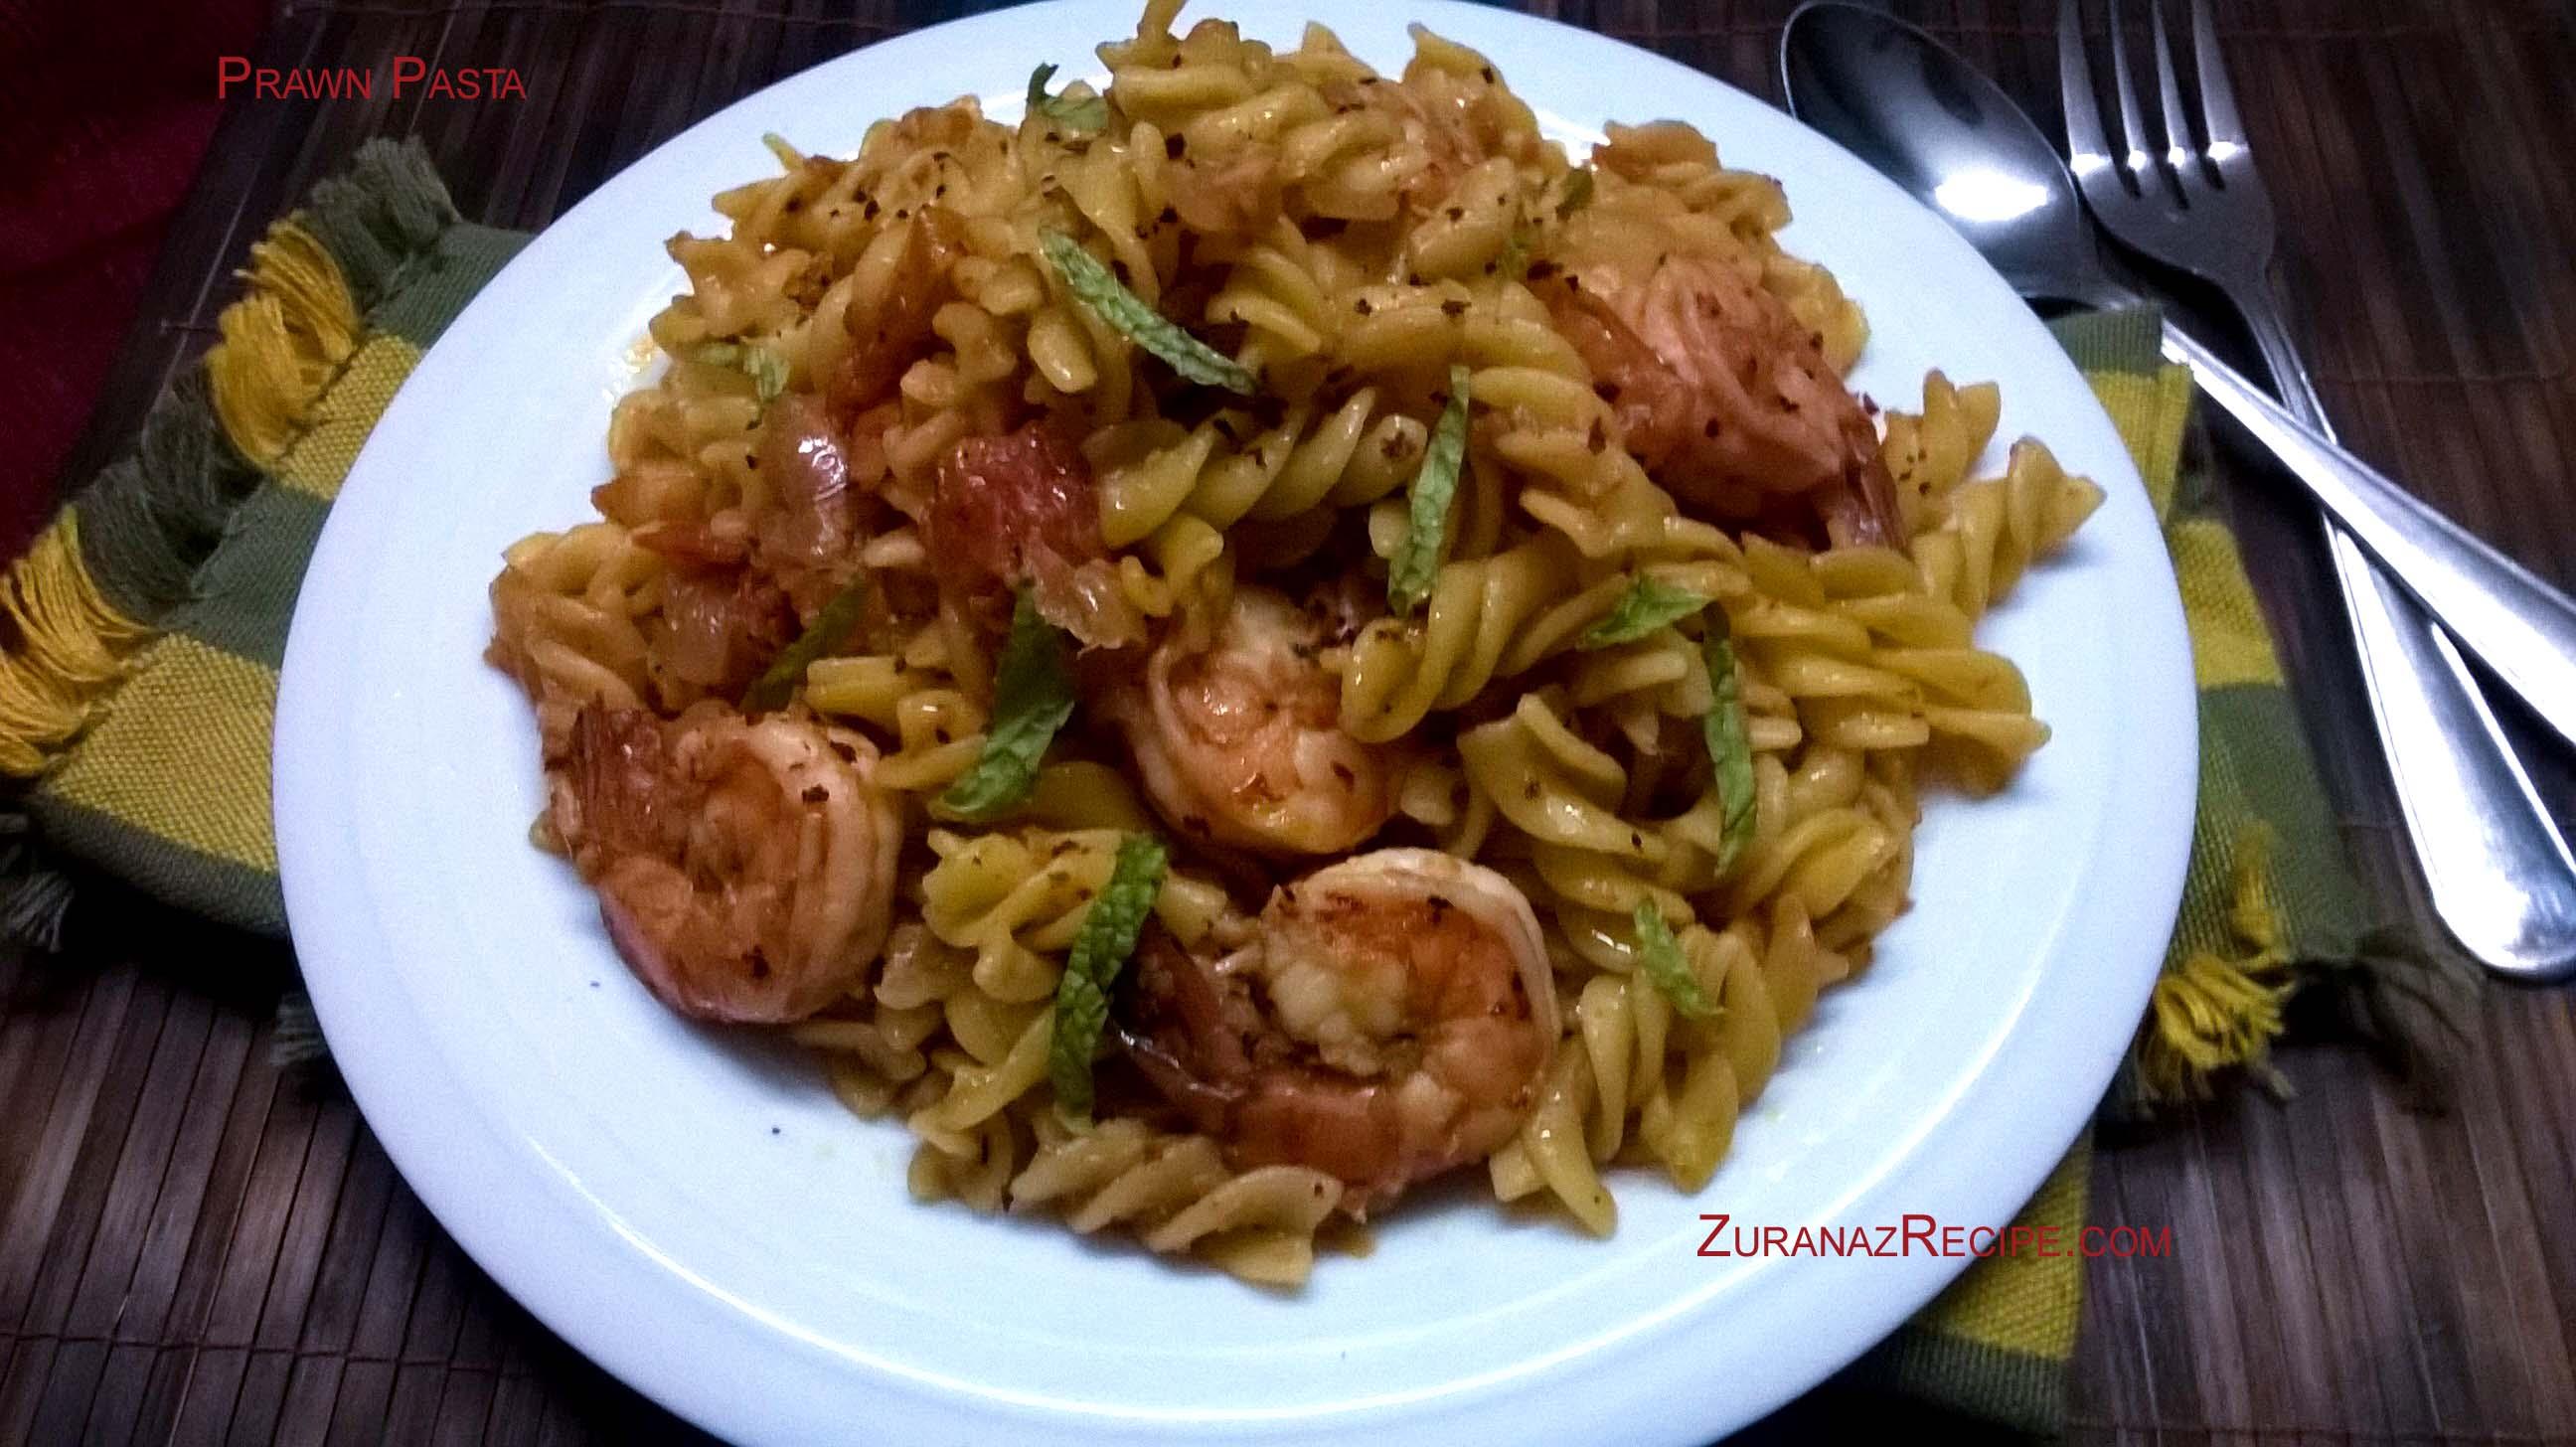 Italian Prawn Pasta